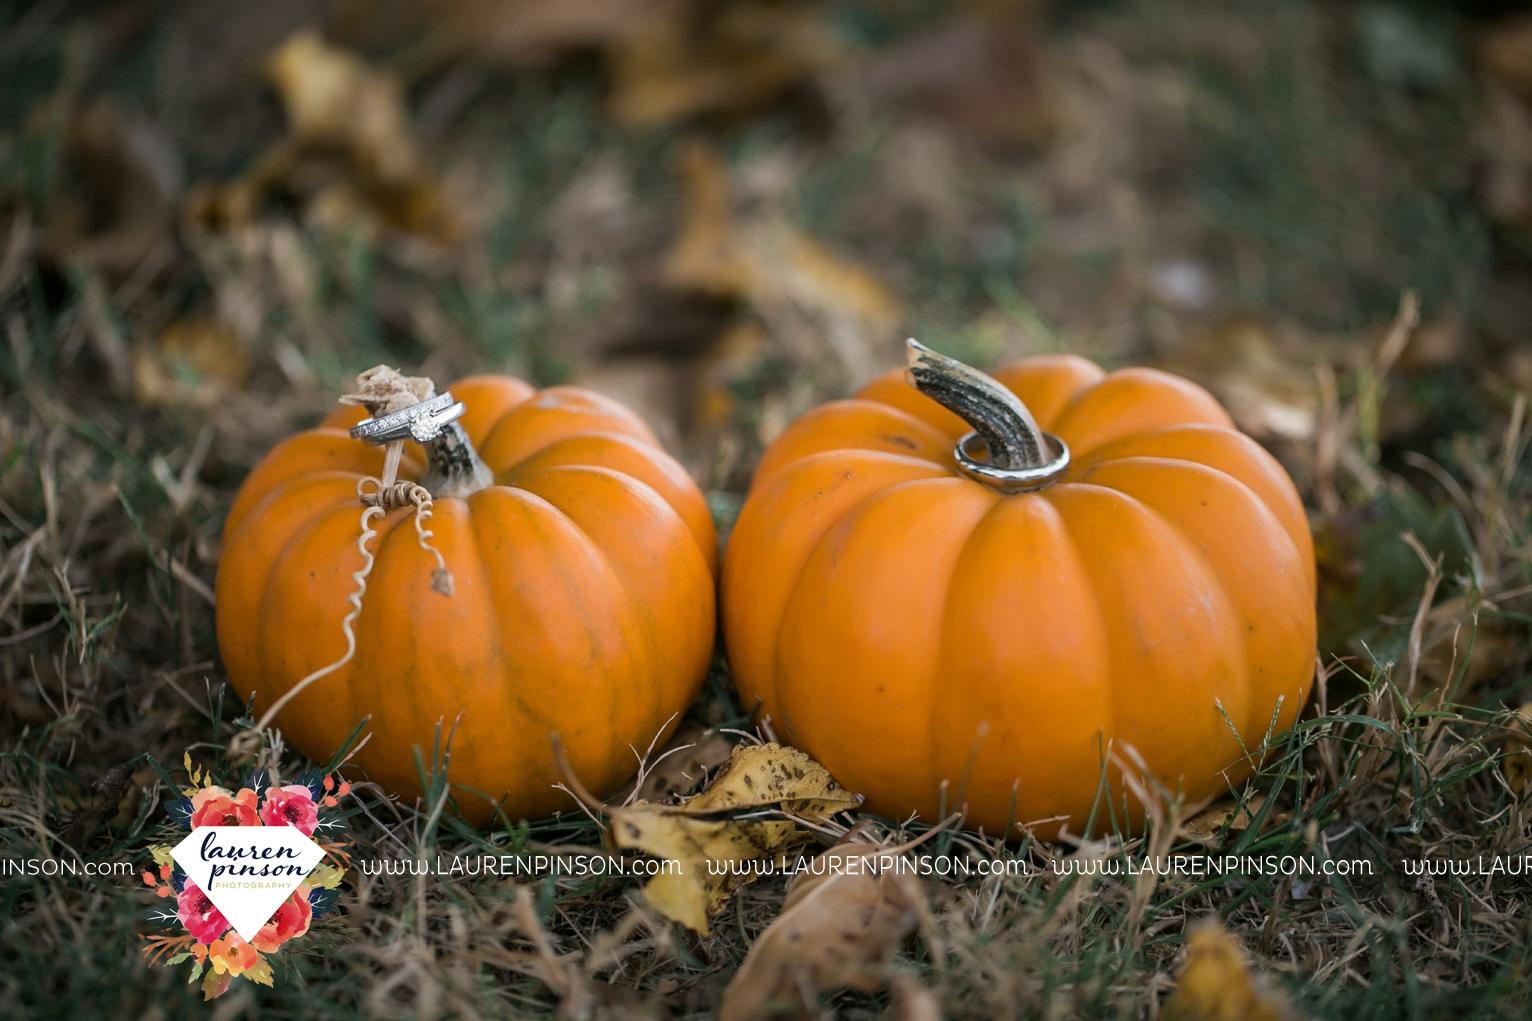 kemp-center-for-the-arts-wichita-falls-texas-wedding-photographer-fall-wedding-pumpkins-118.jpg